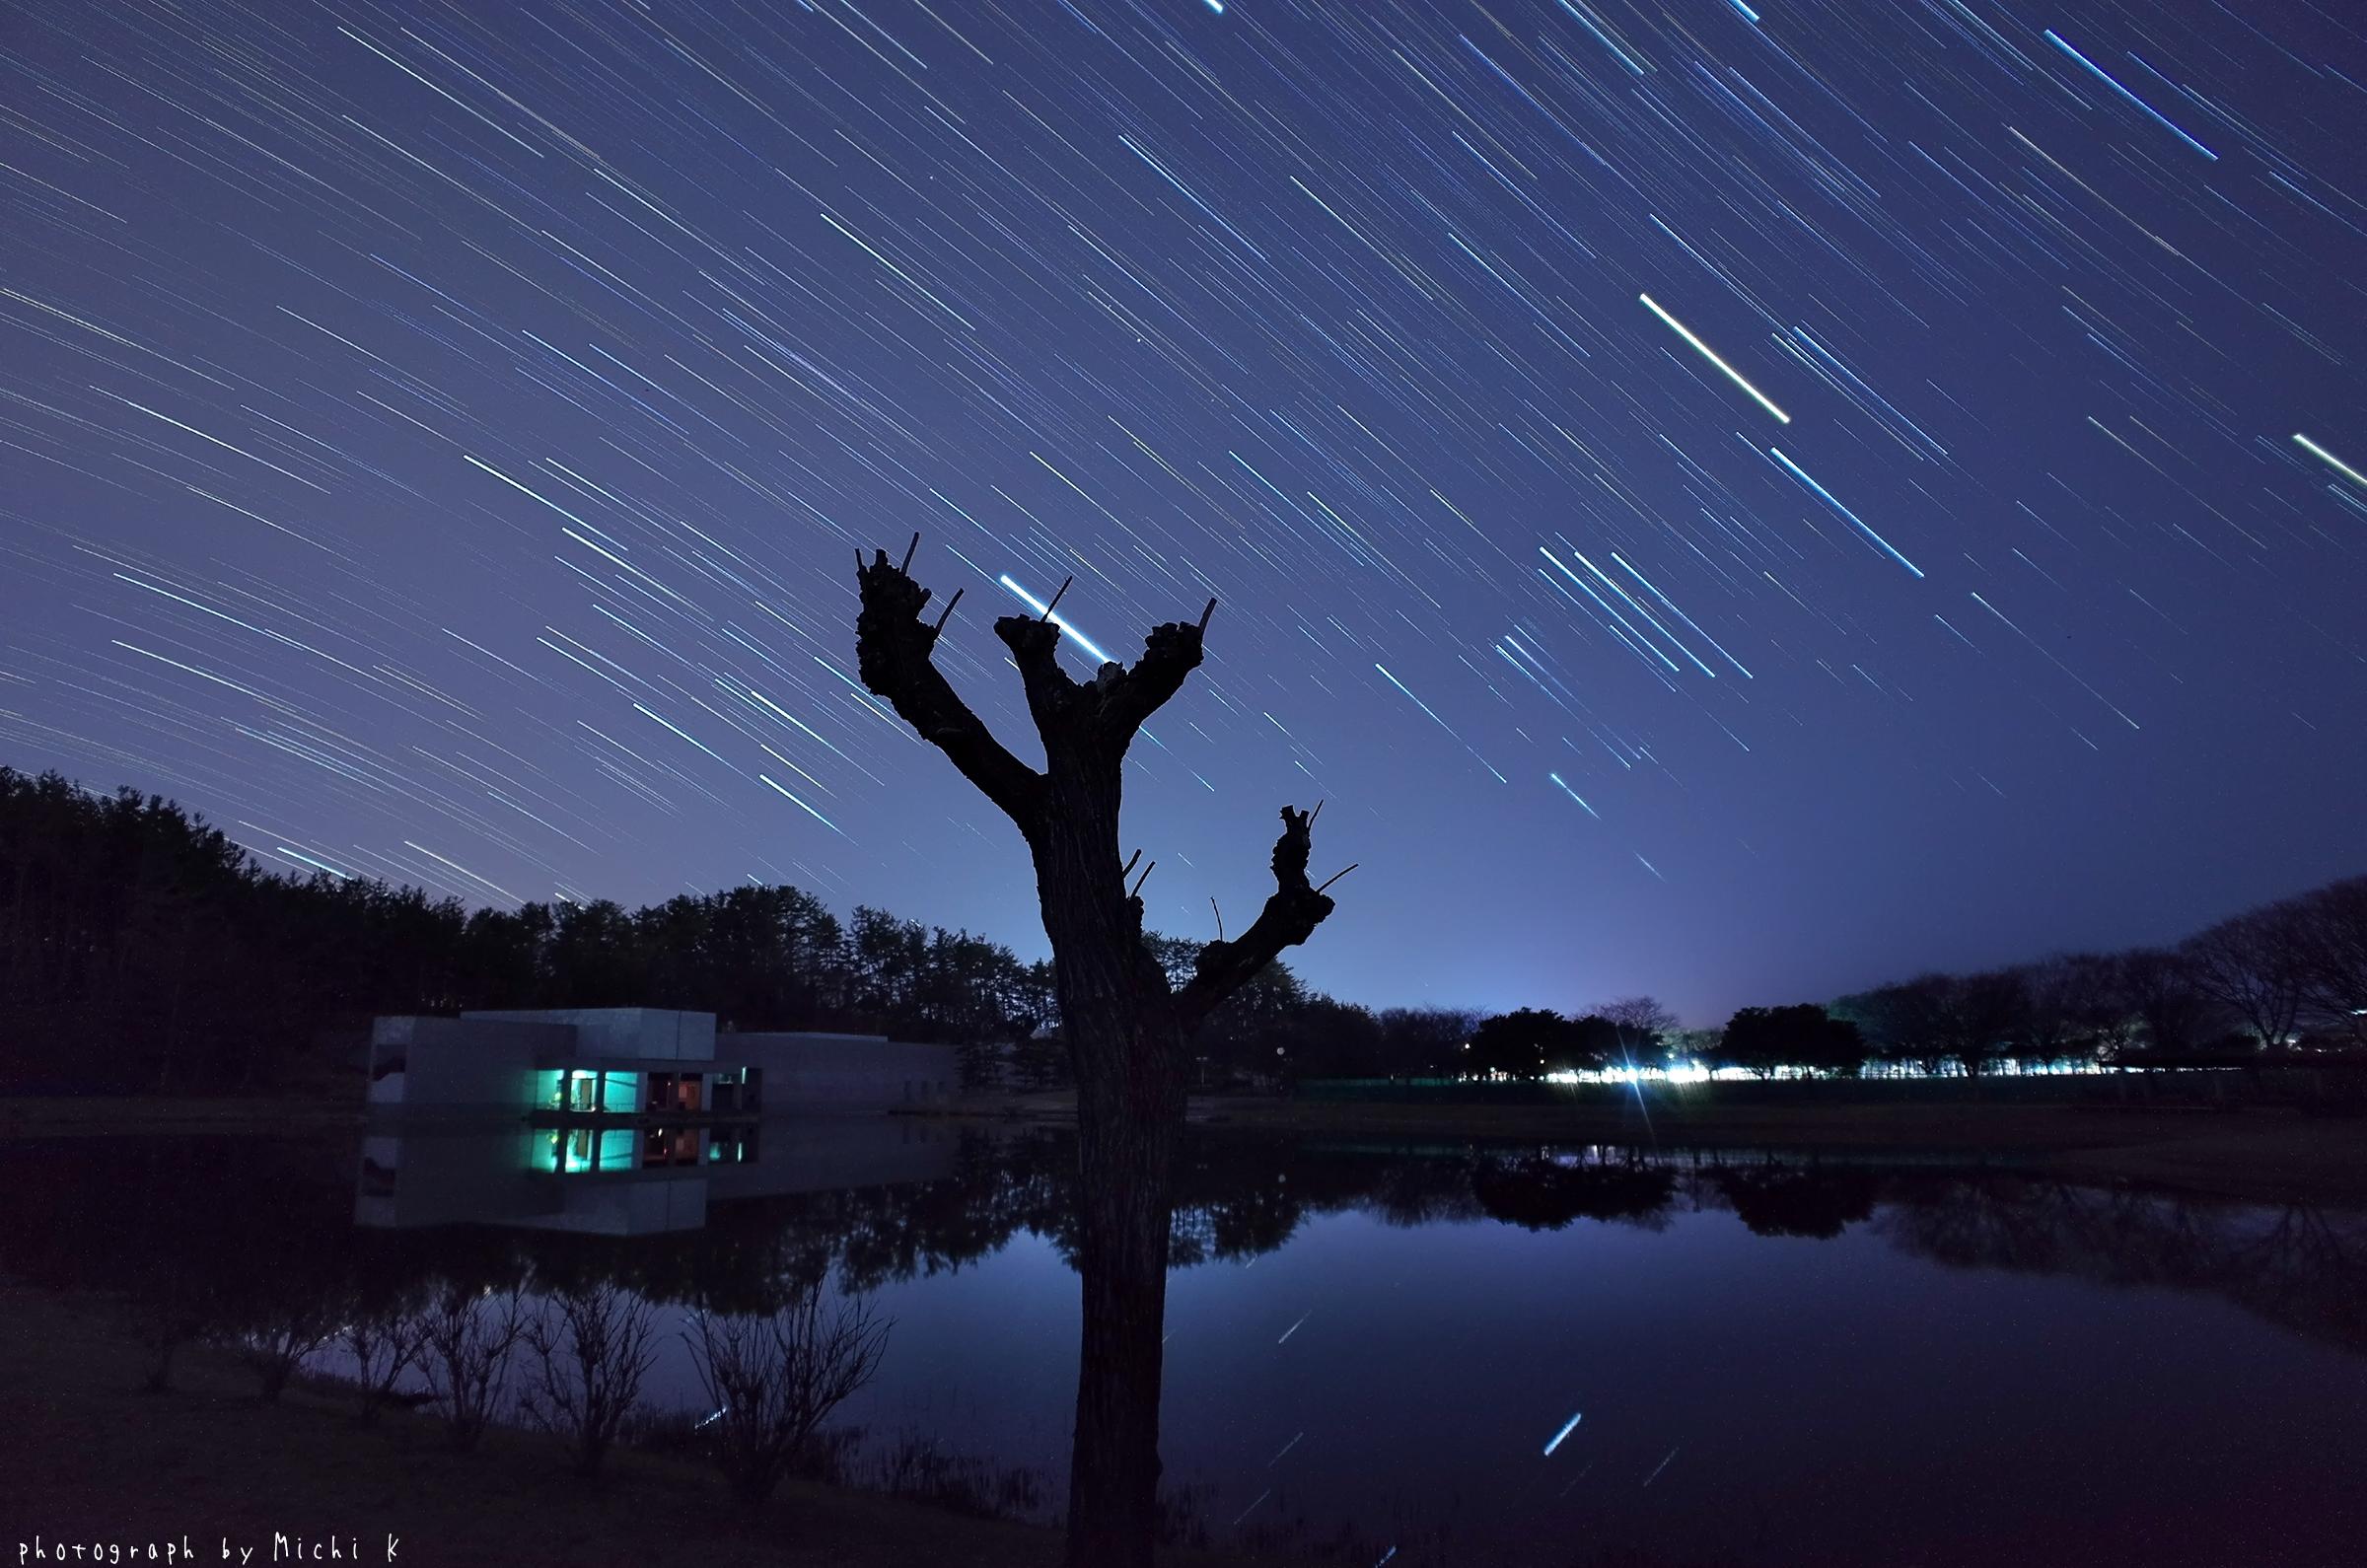 土門拳記念館2019-3-9夜(写真その3)